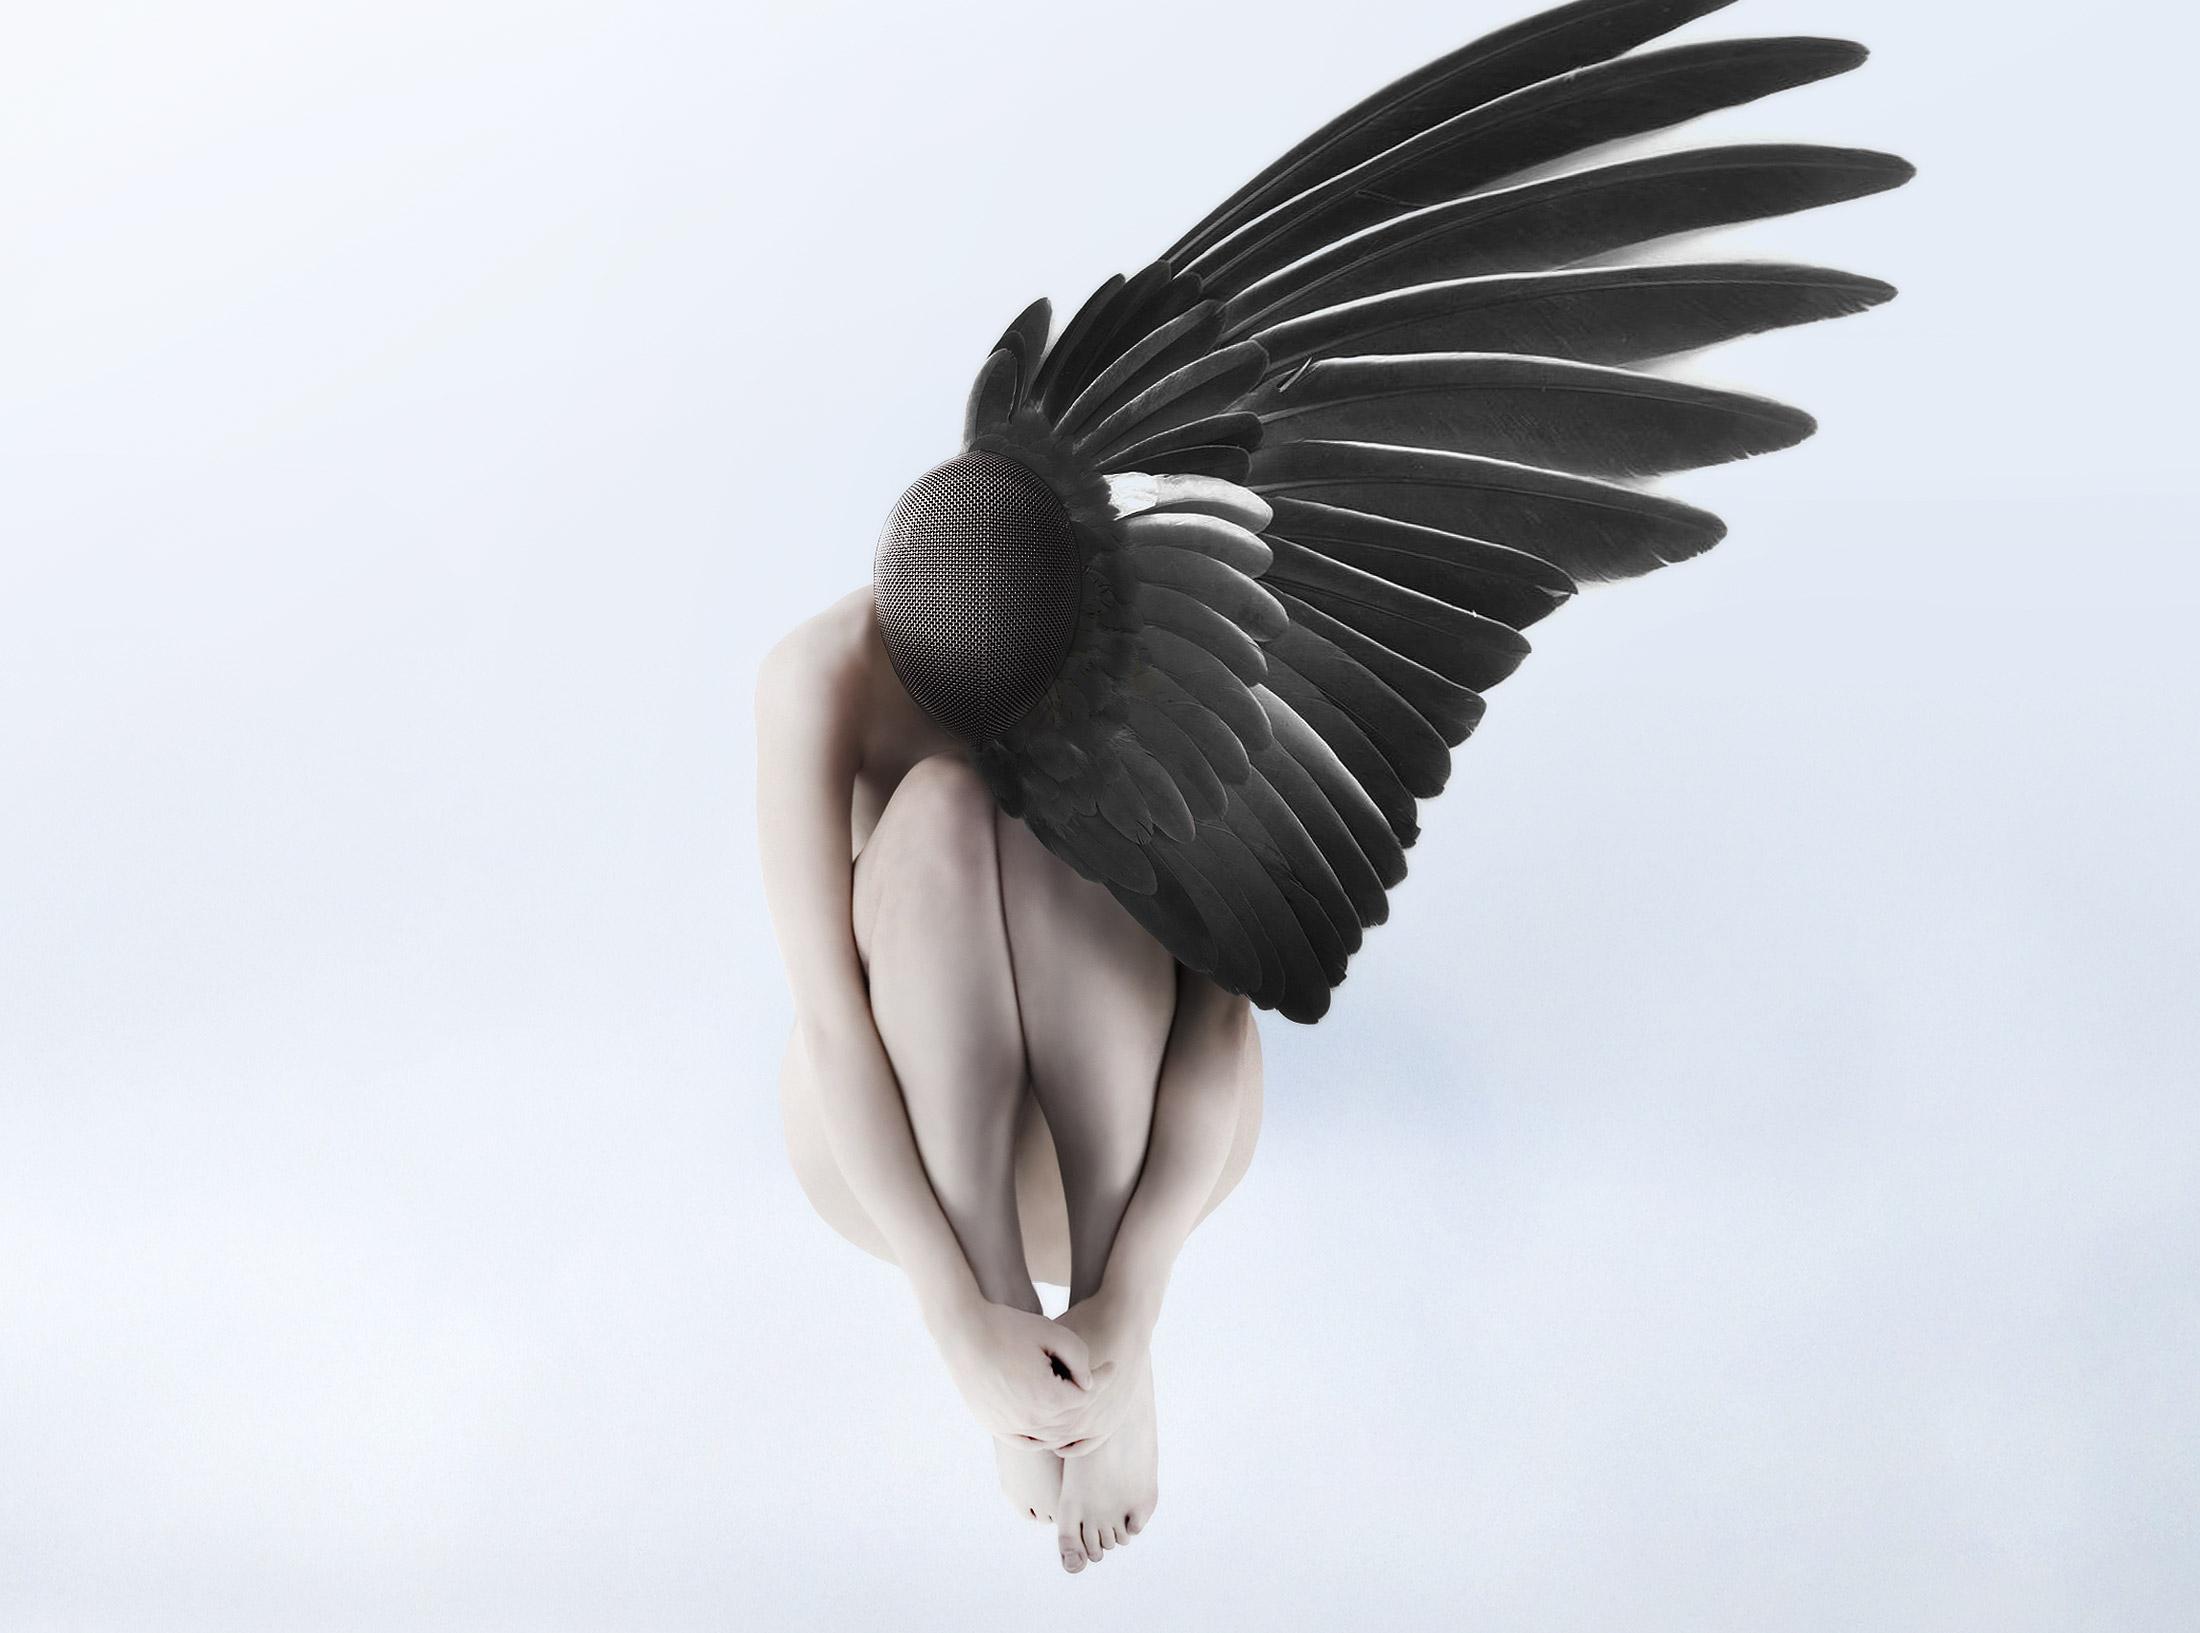 The White Sky XXXI - Stefano Bonazzi